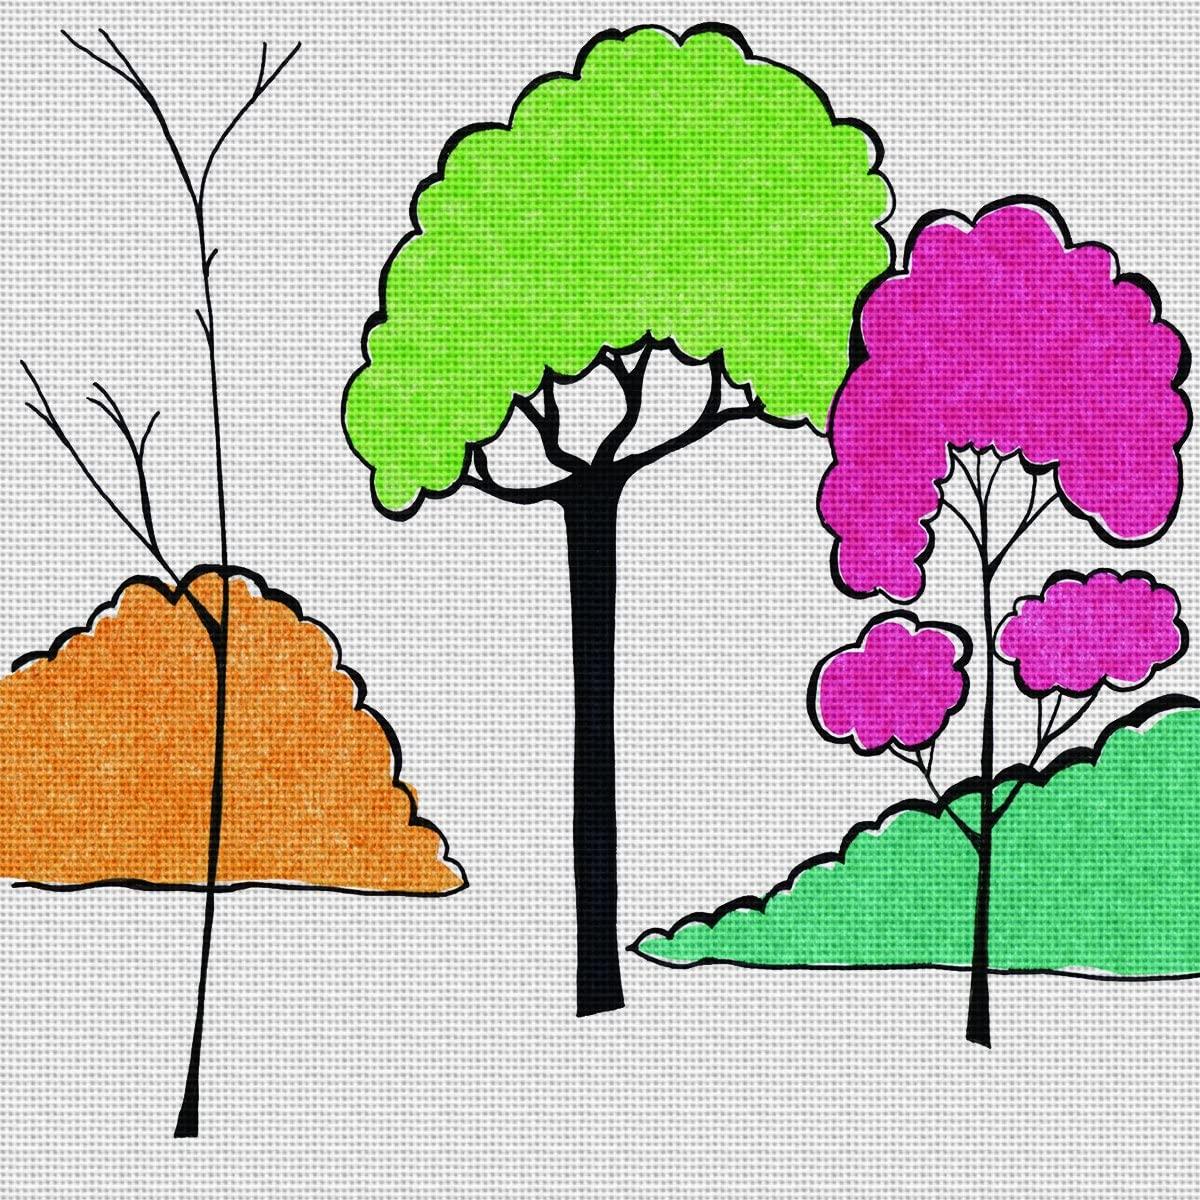 Art Needlepoint Pink Tree Needlepoint Kit by Perkins & Morley